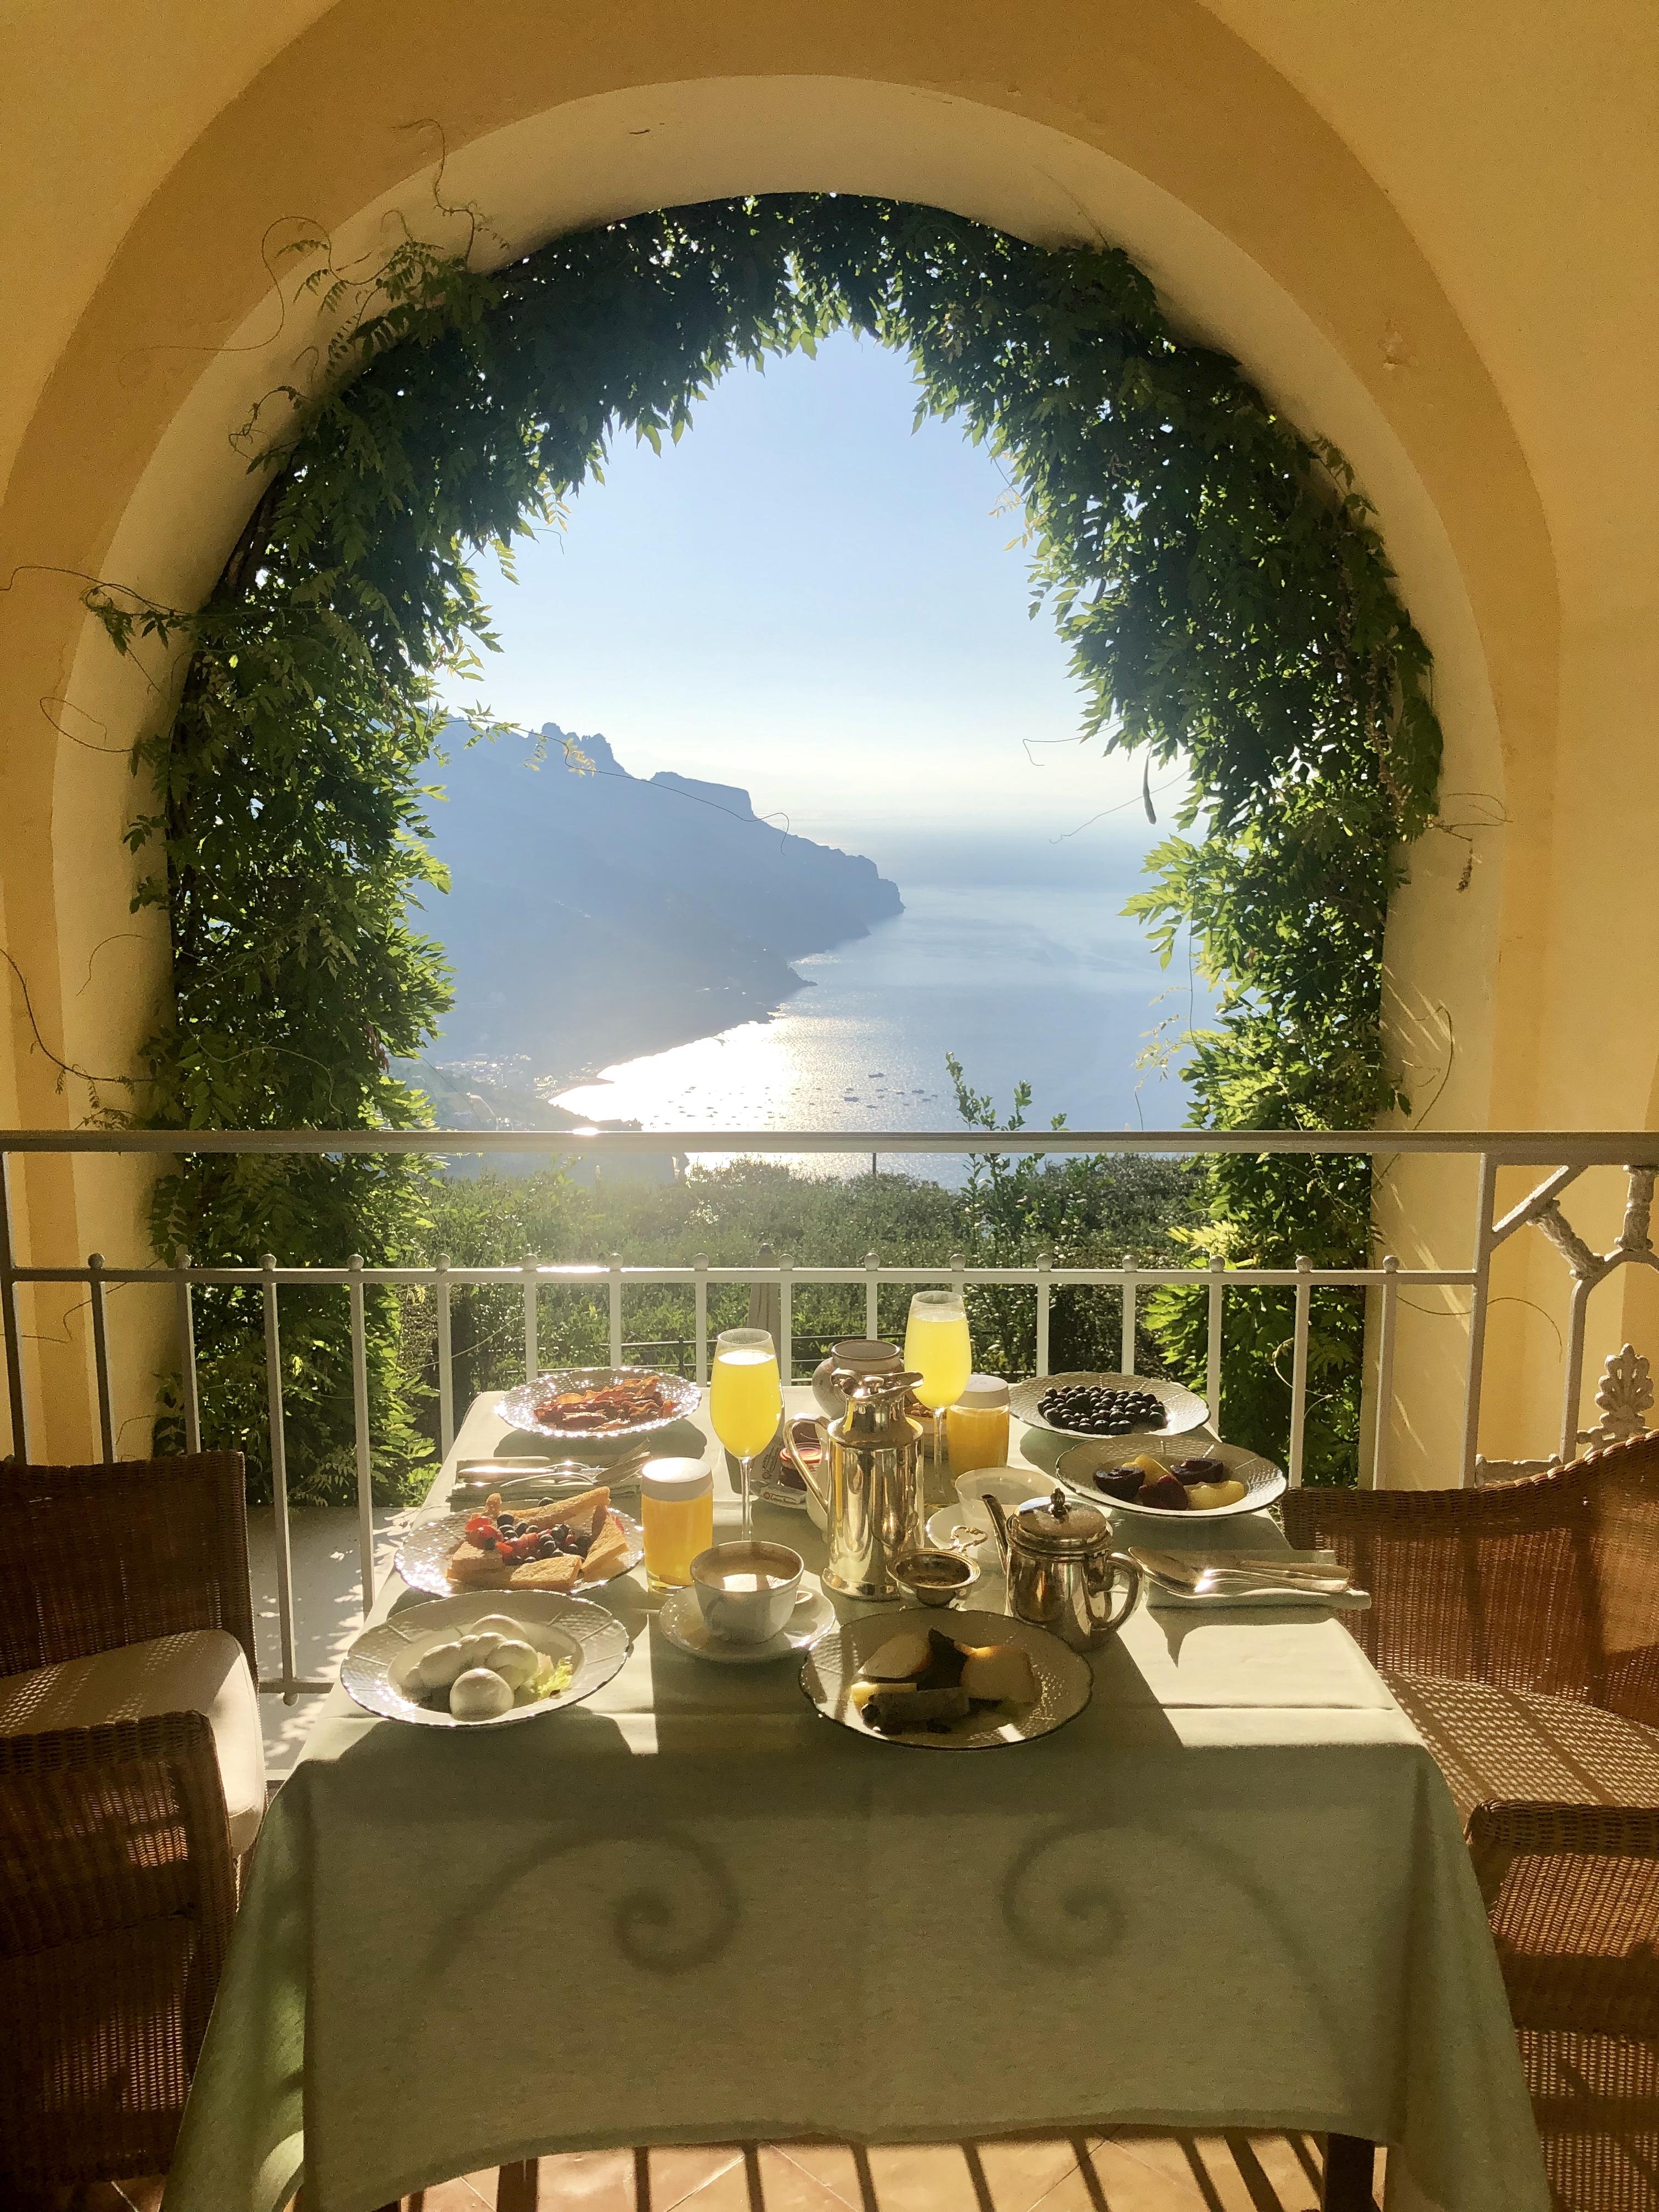 Balcony at the Belmond Hotel Caruso